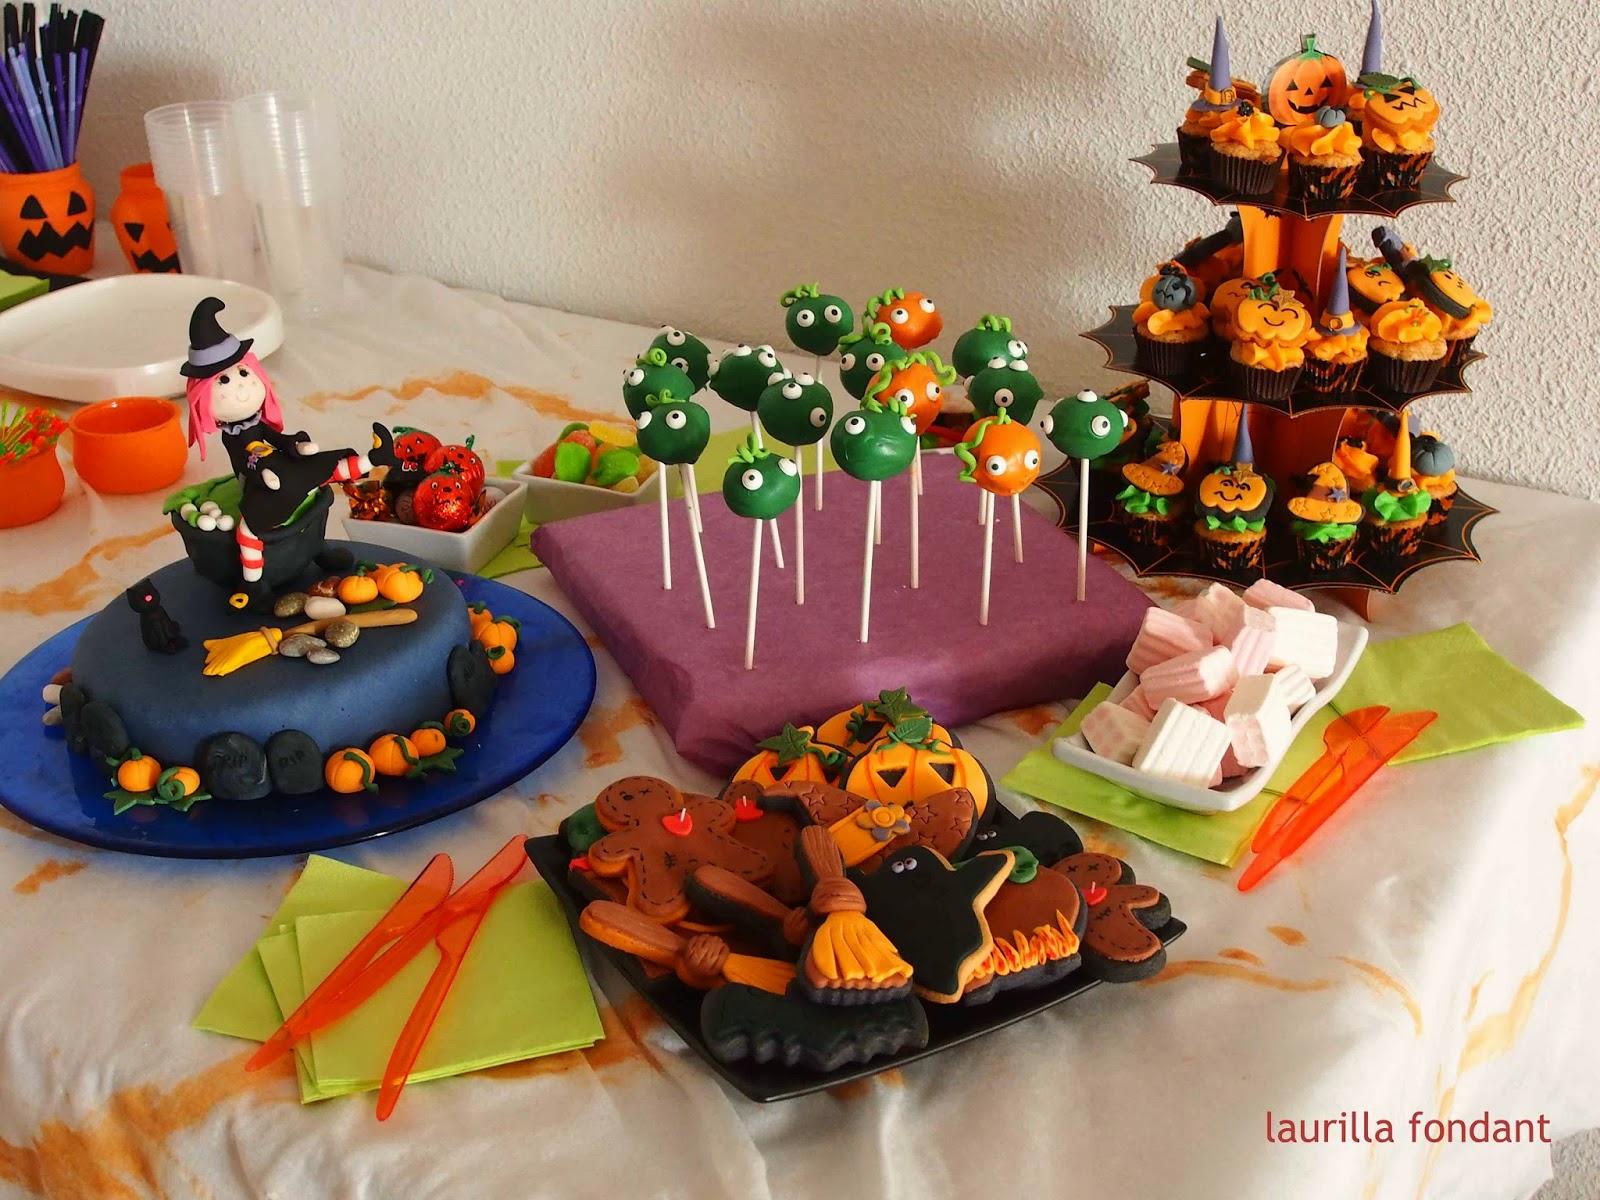 Laurilla fondant mesa dulce de halloween 2012 for Decoracion mesa halloween